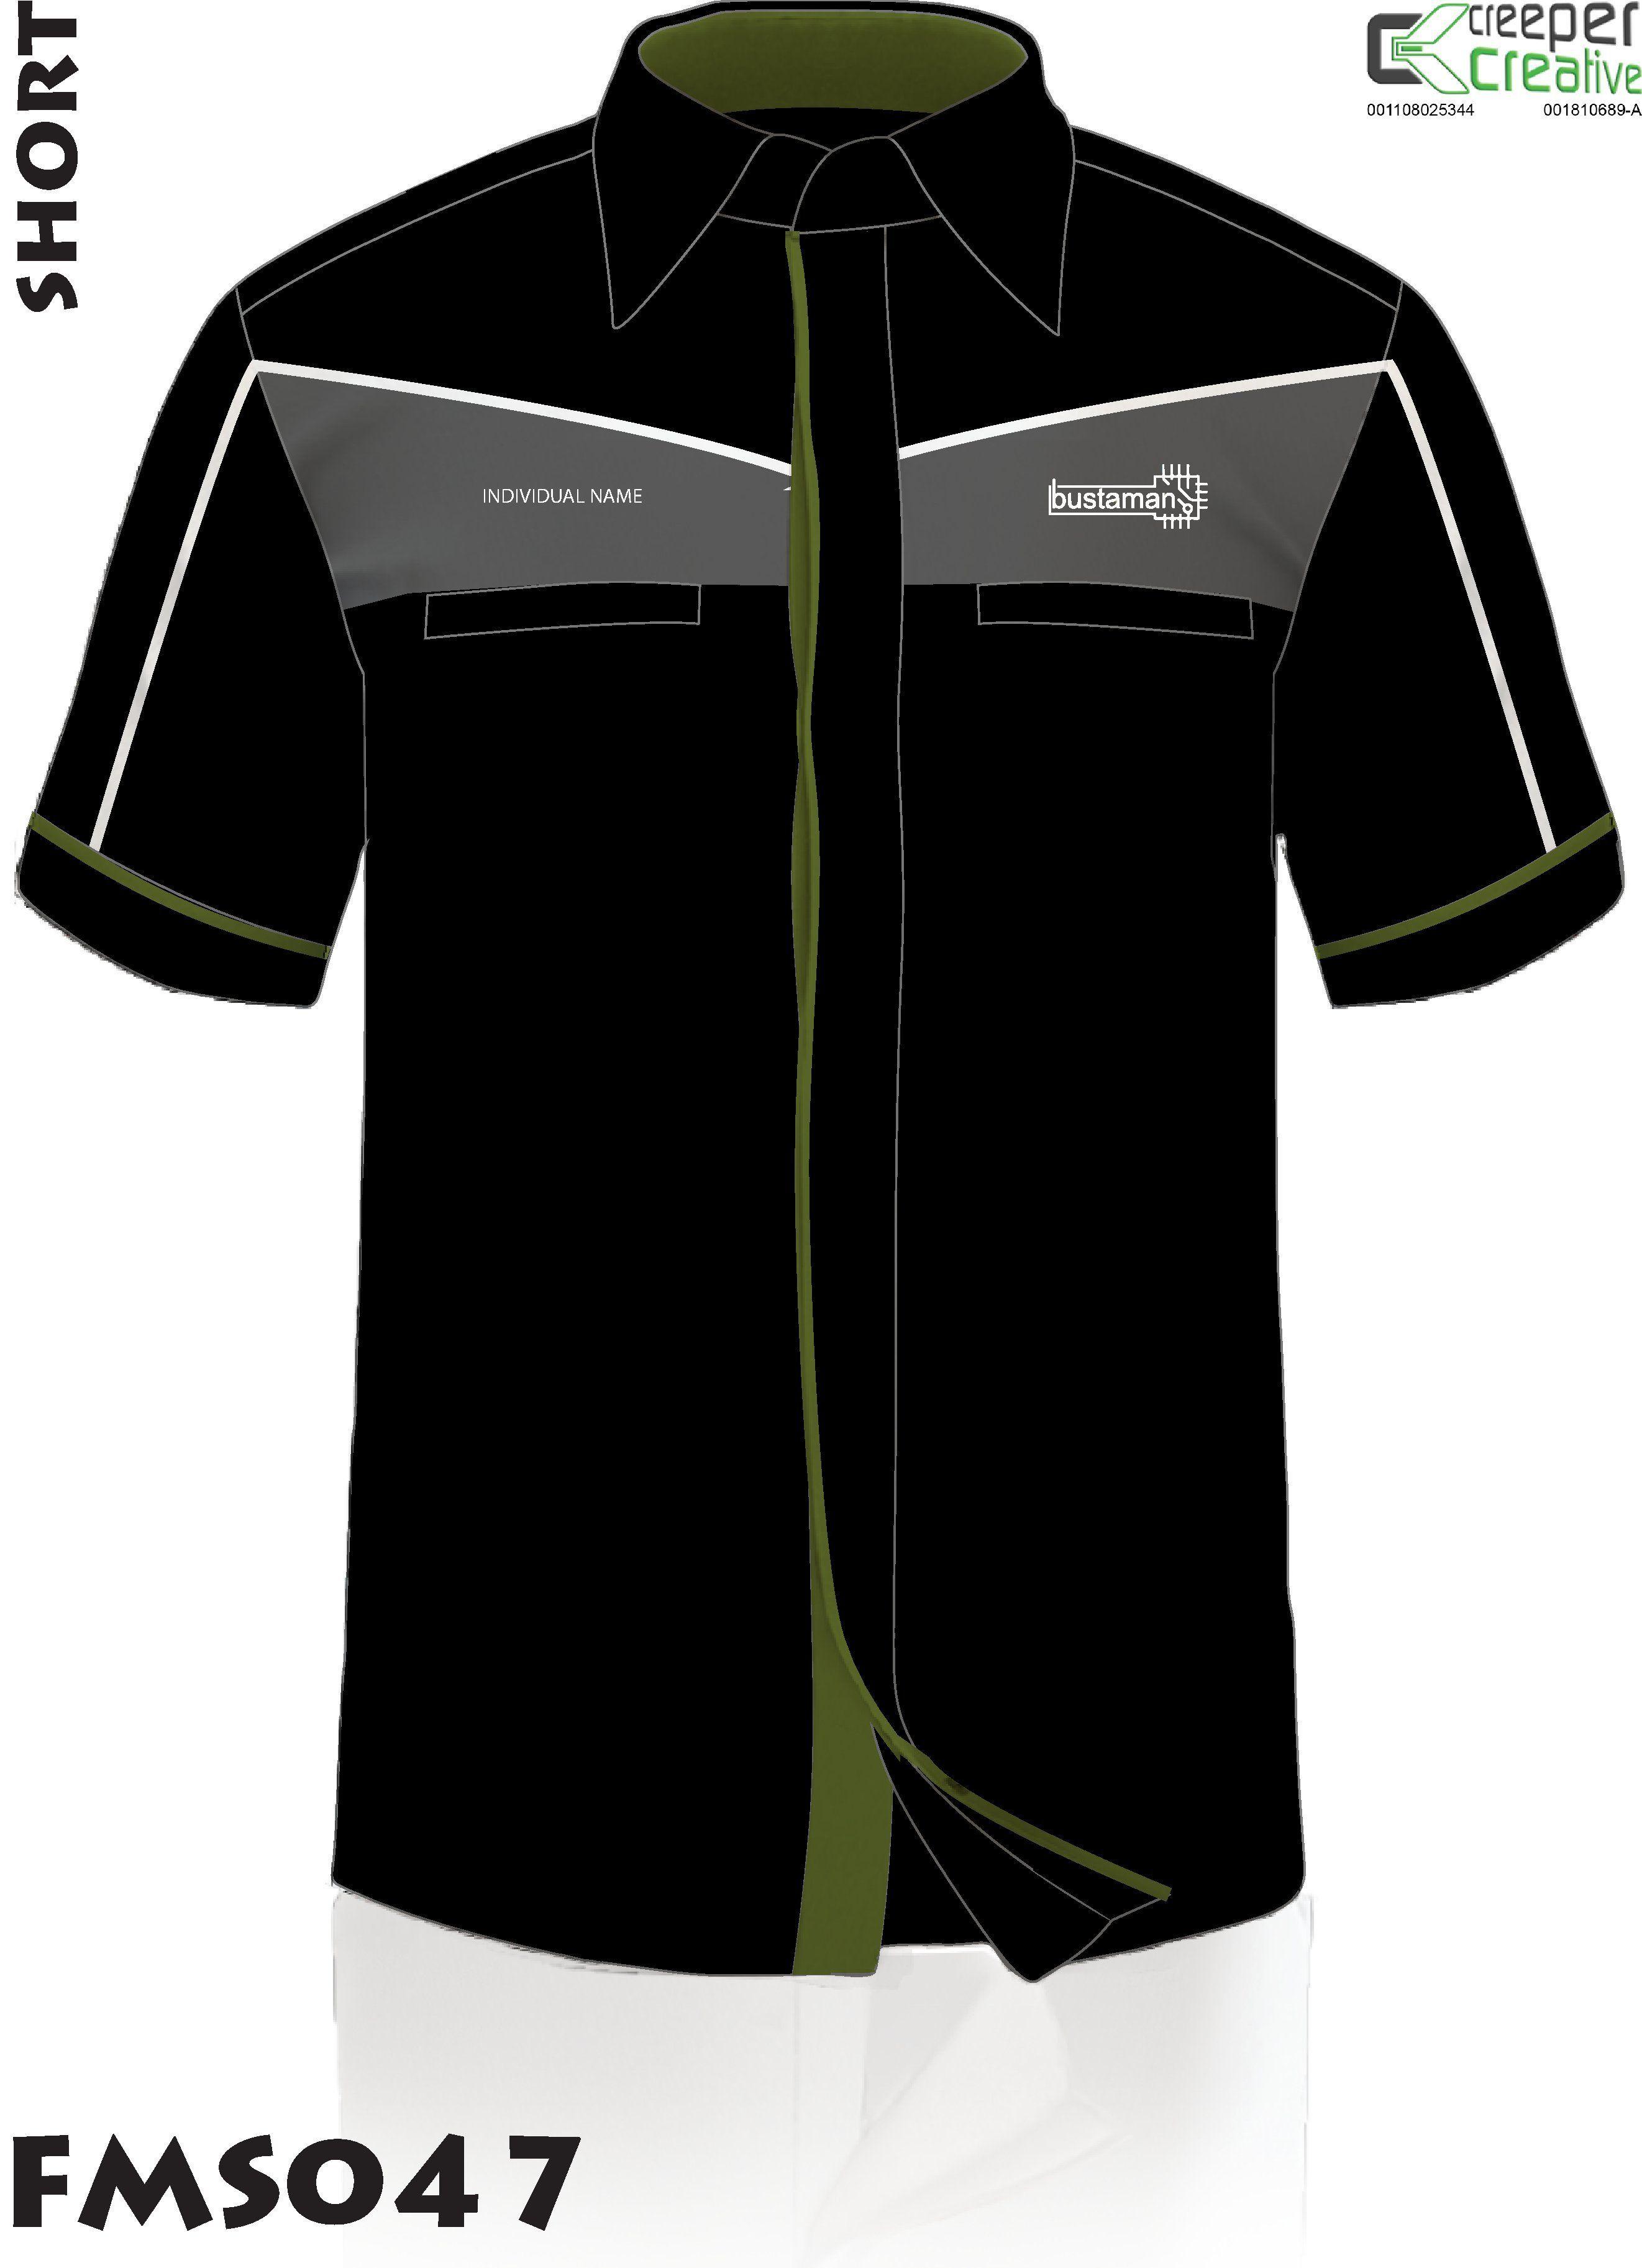 Uniforms Is A Best Of Uniform Manufacturer 0361435225 Corporate Shirts Shirt Designs Shirt Shop